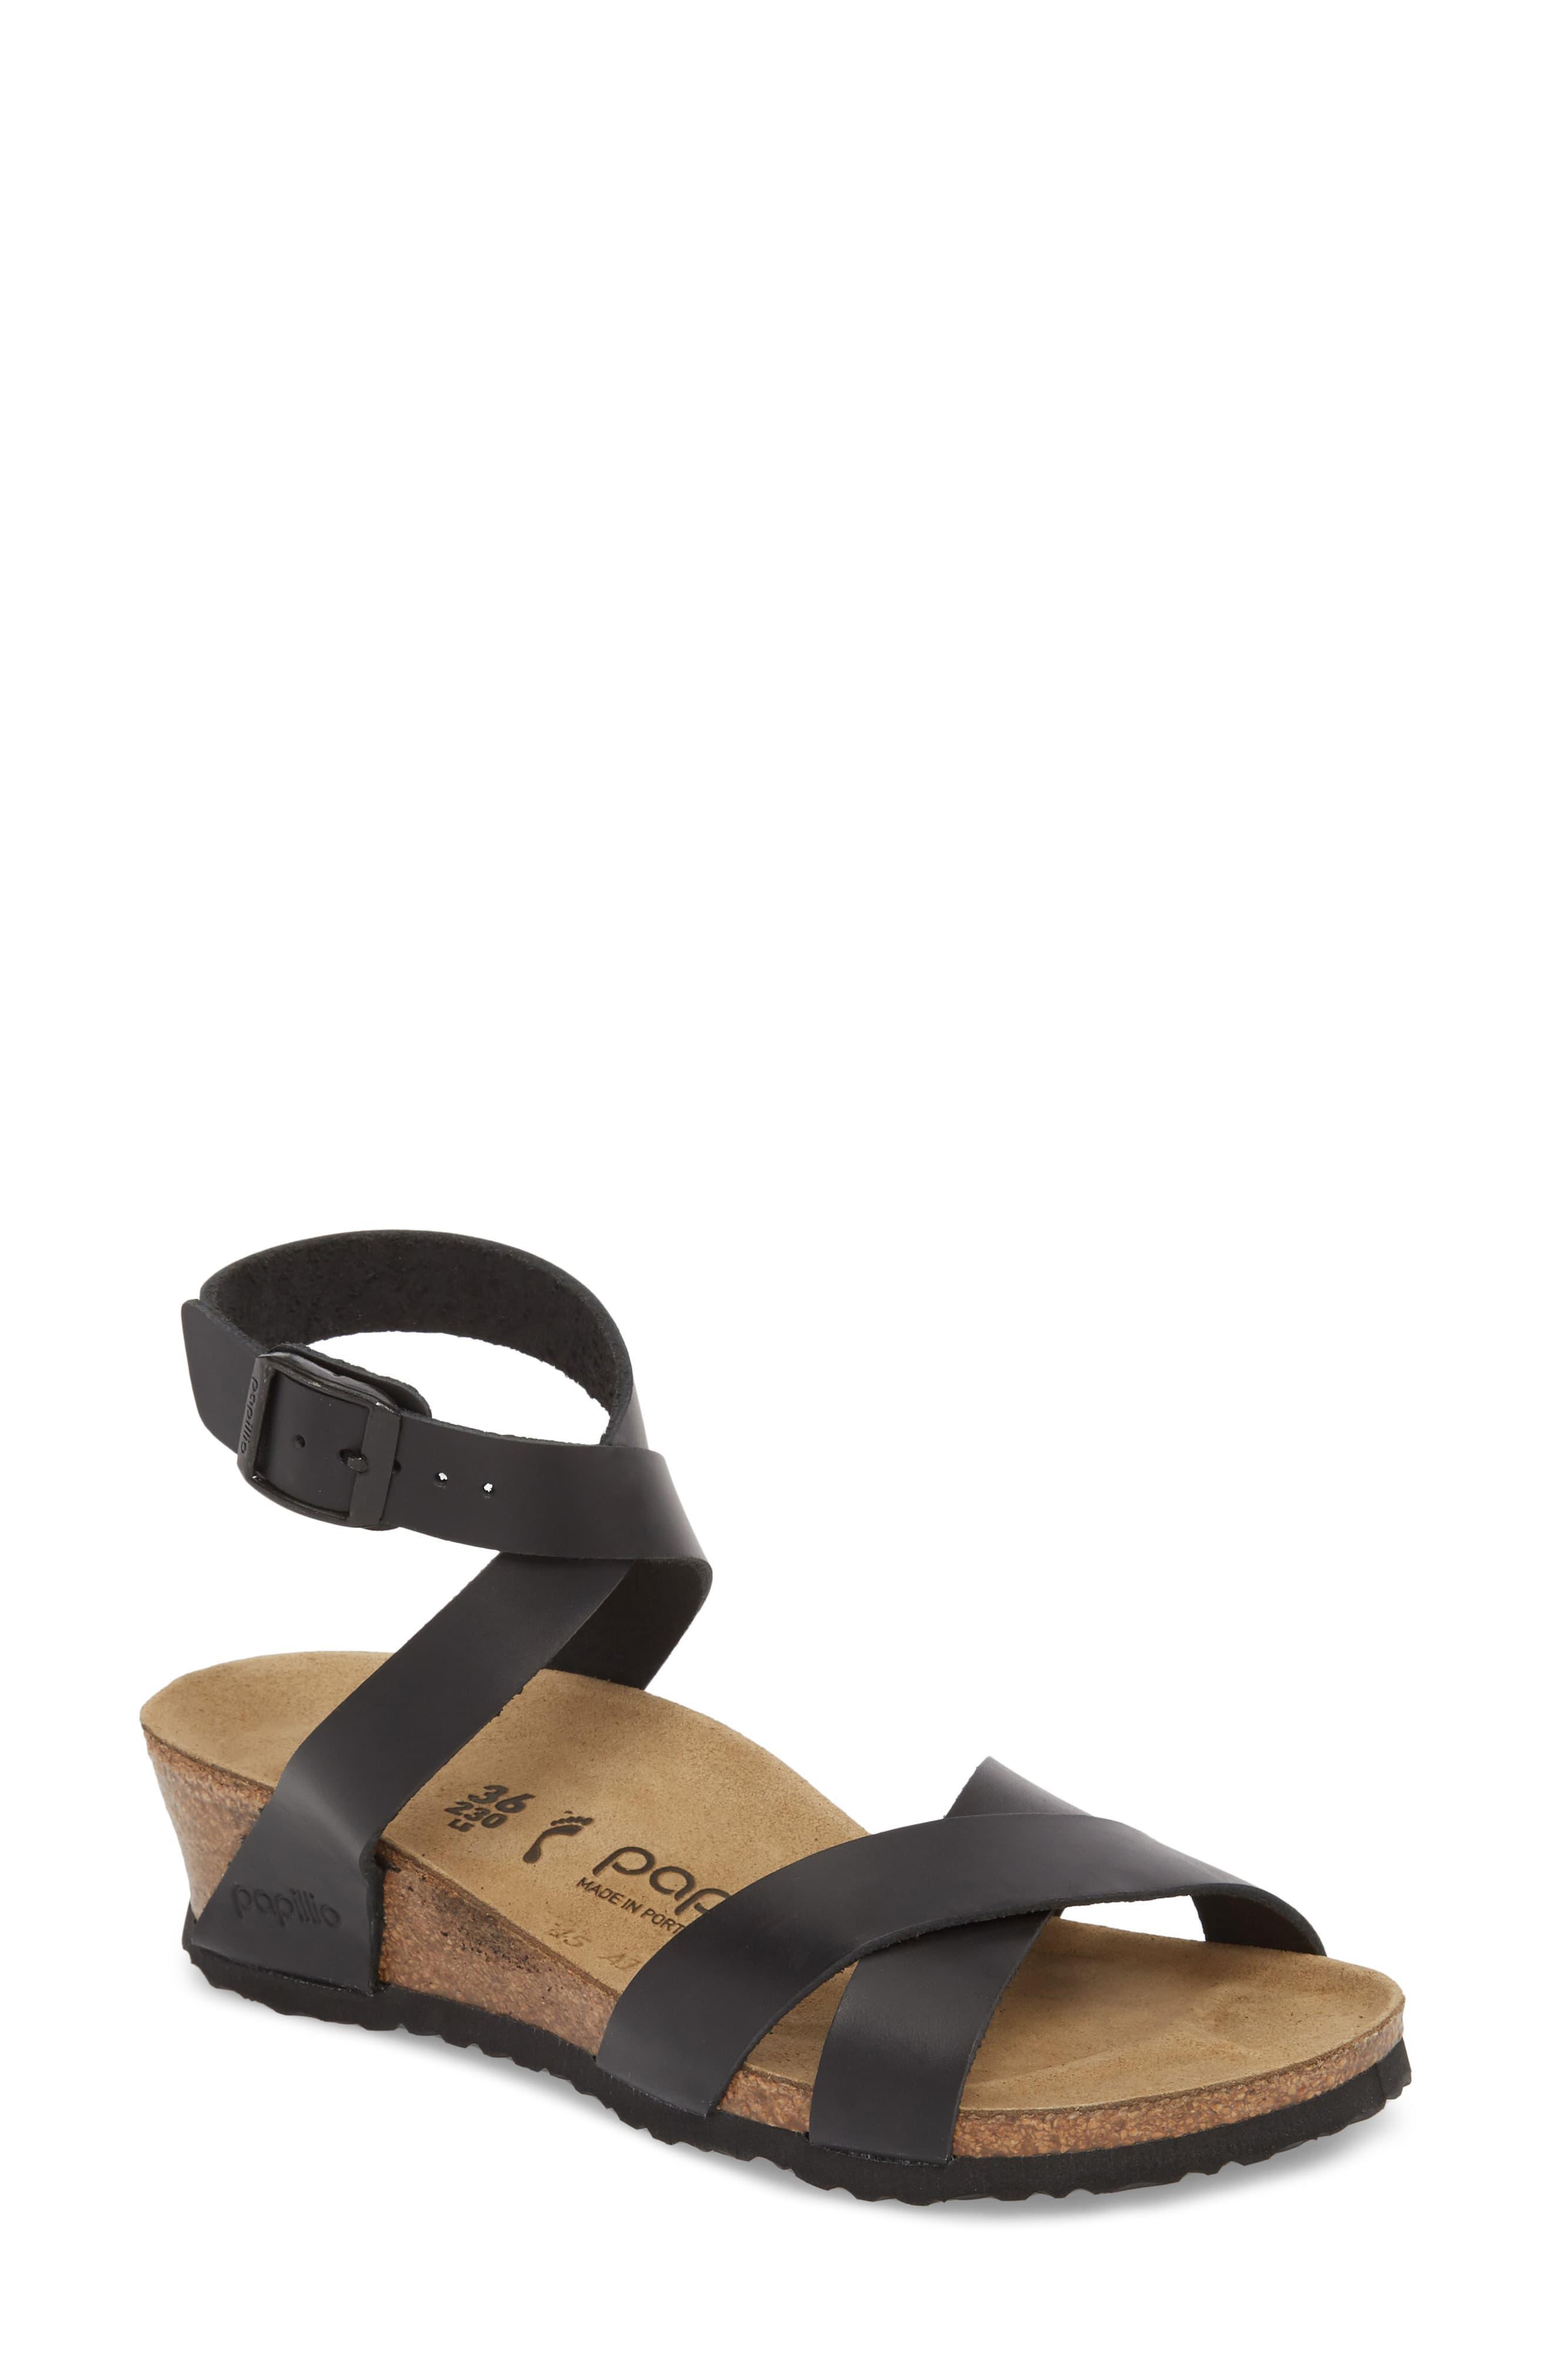 67693ef009 Birkenstock Papillio By Lola Wedge Sandal in Black - Save 1% - Lyst